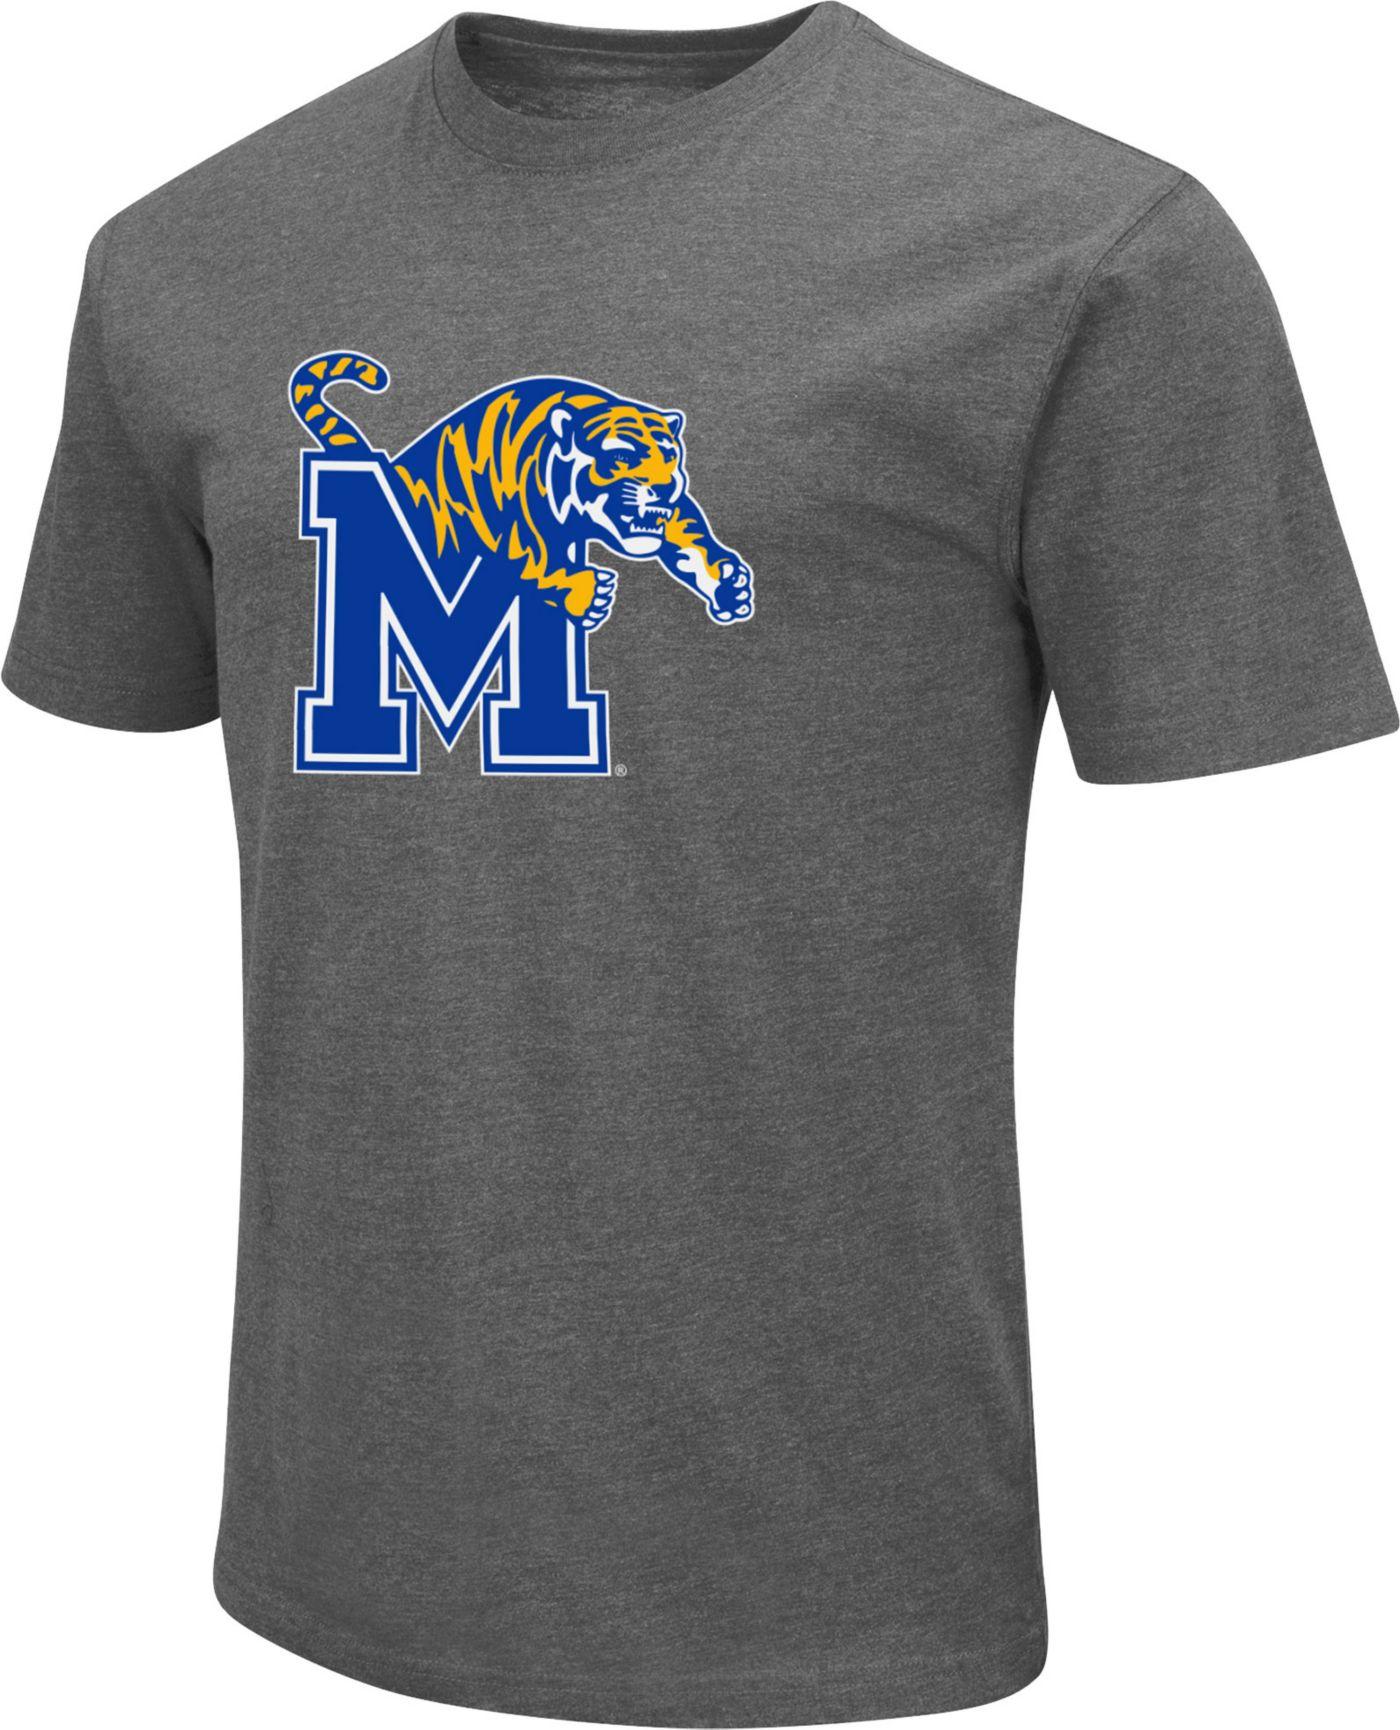 Colosseum Men's Memphis Tigers Grey Dual Blend T-Shirt